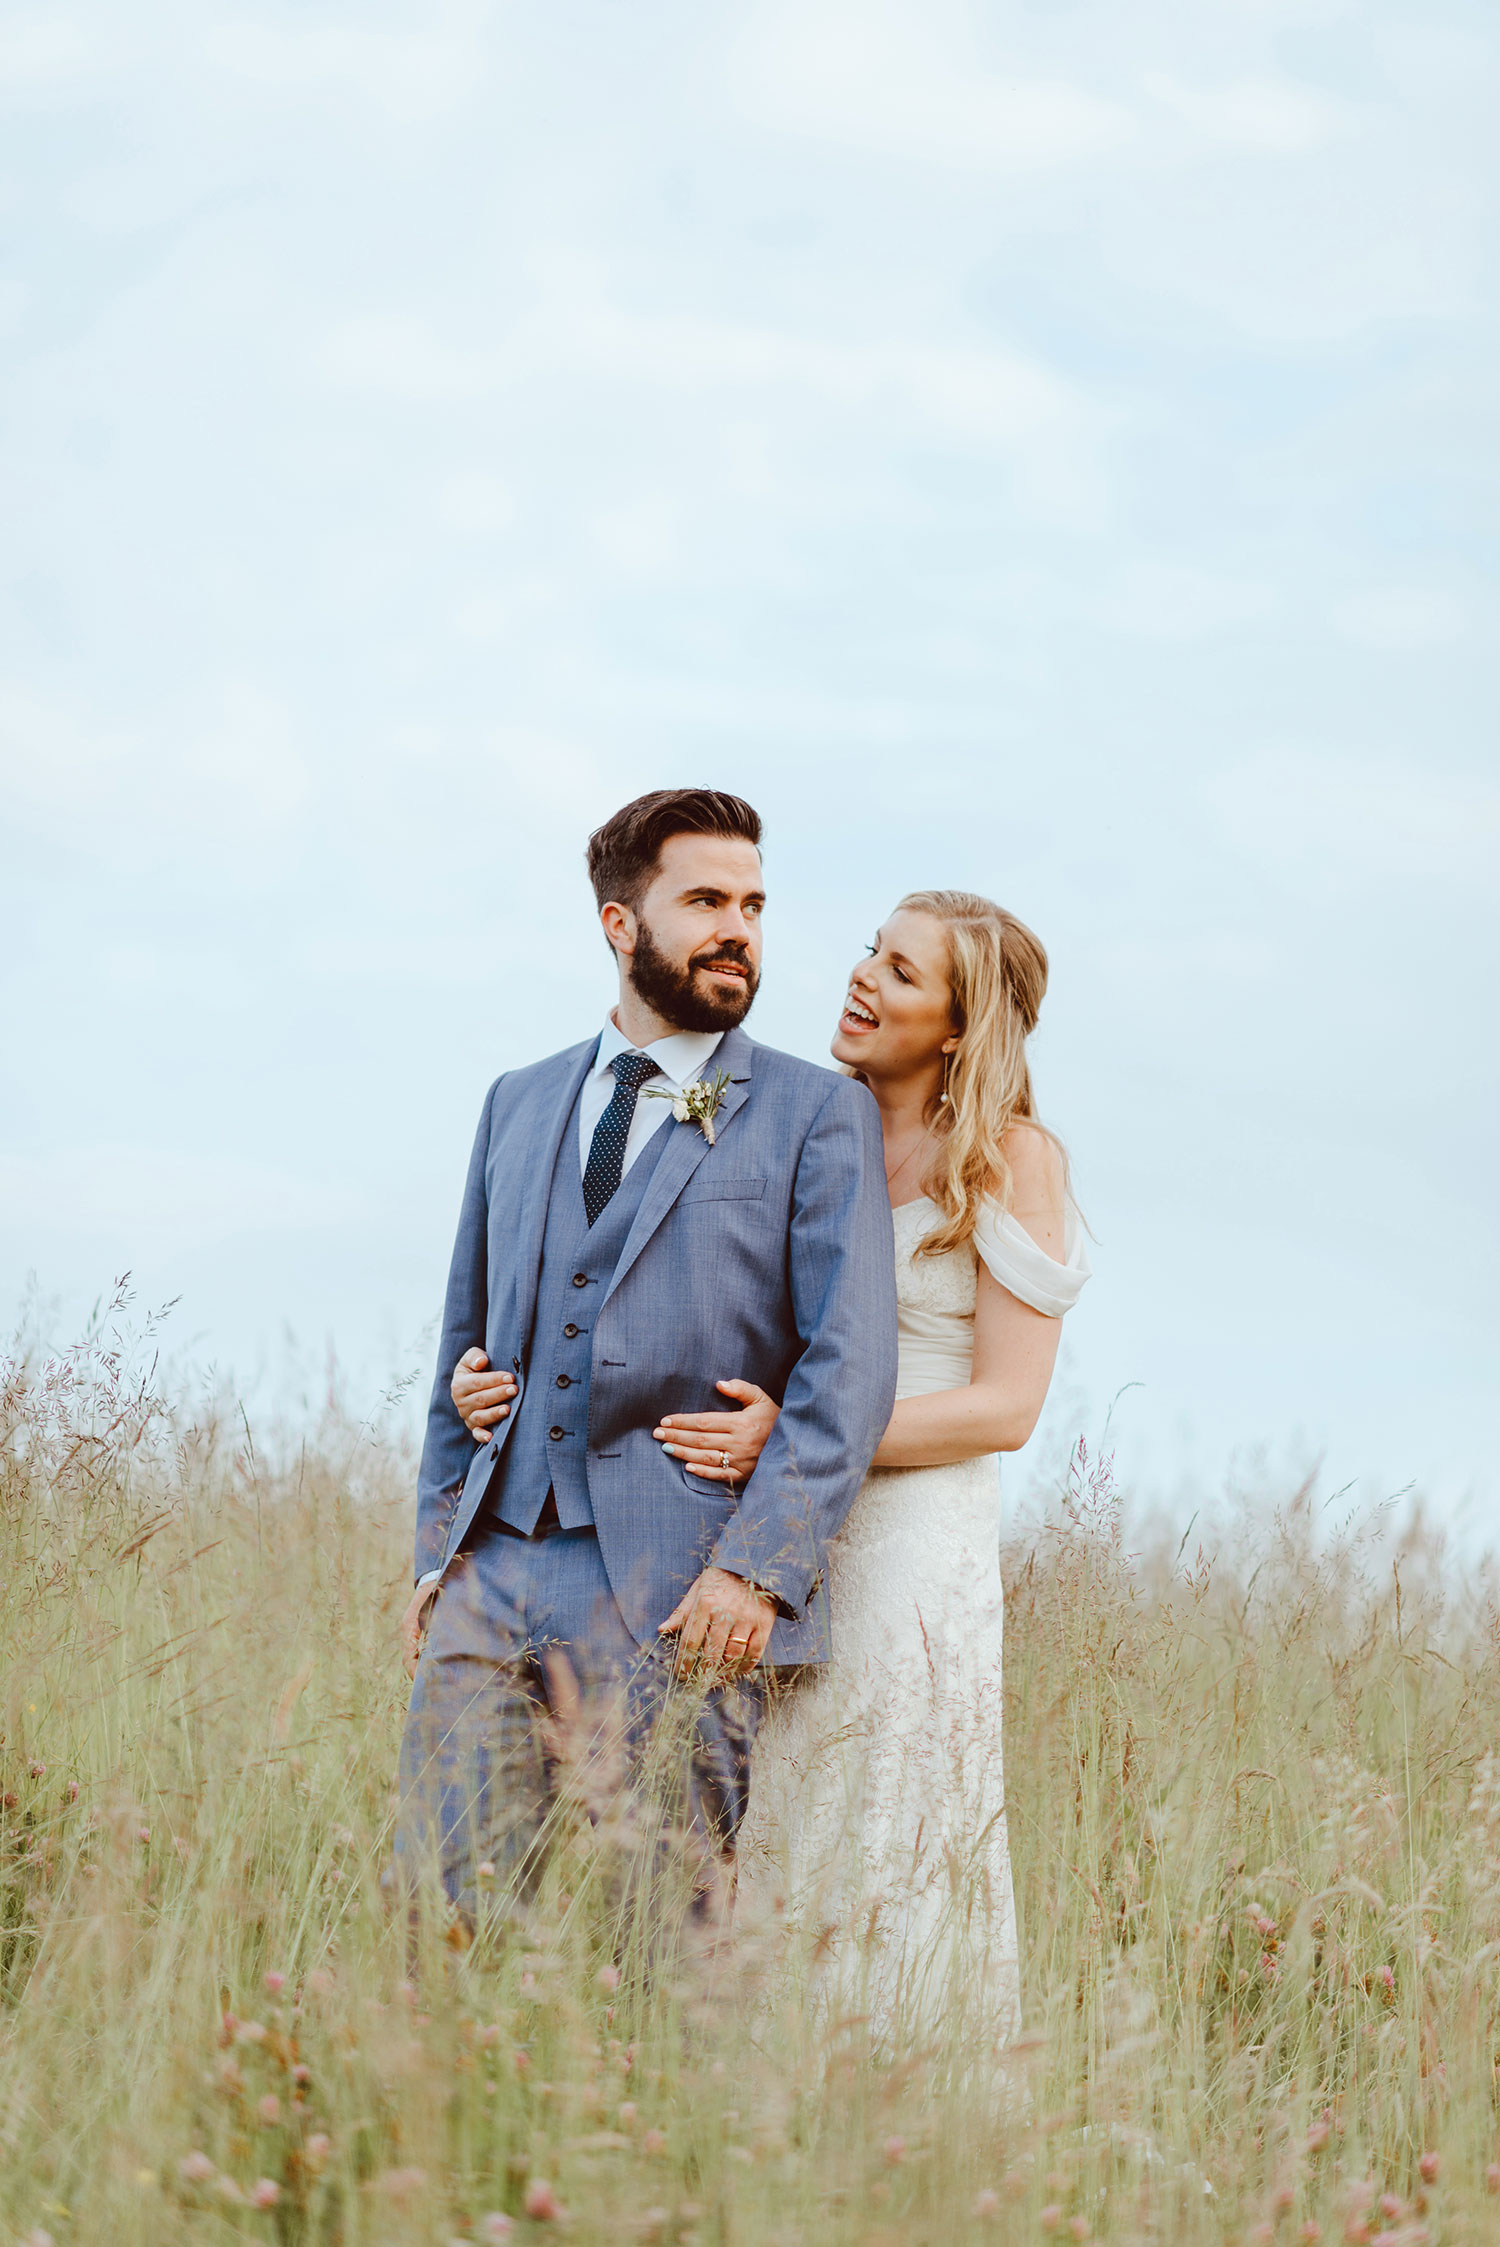 castlemartyr-wedding-photography-0130_0501.jpg